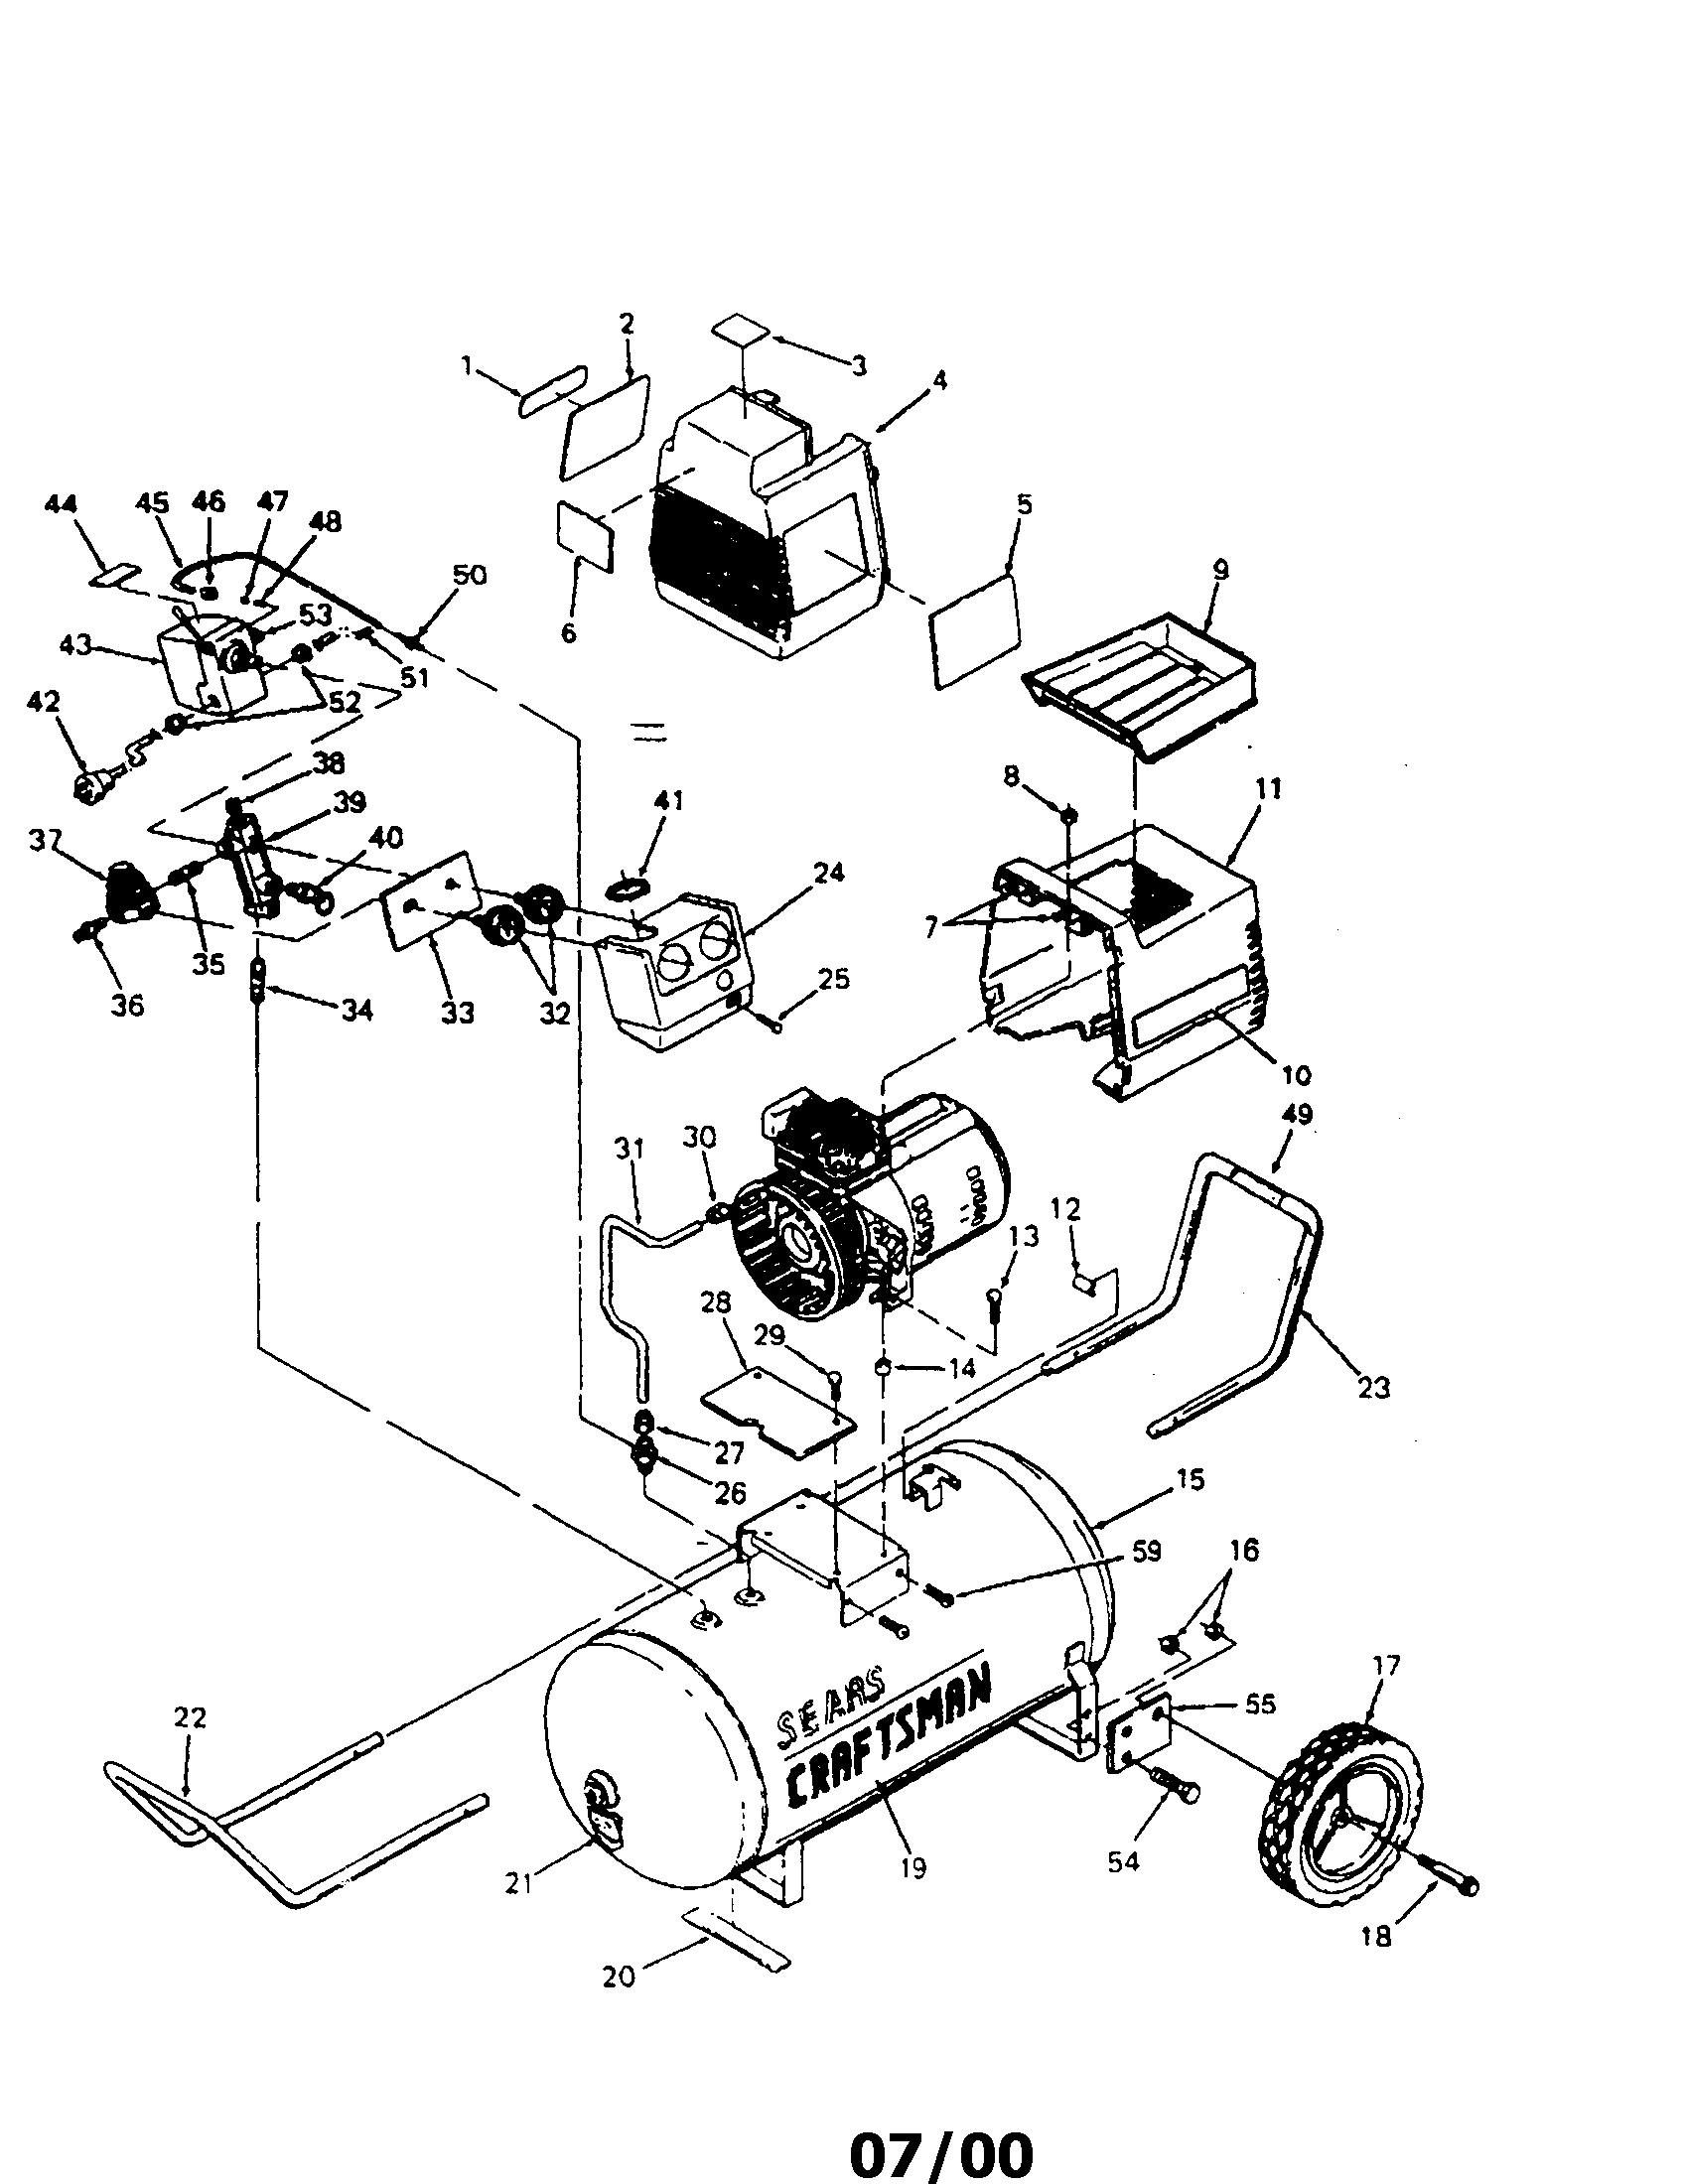 919 craftsman pressor parts